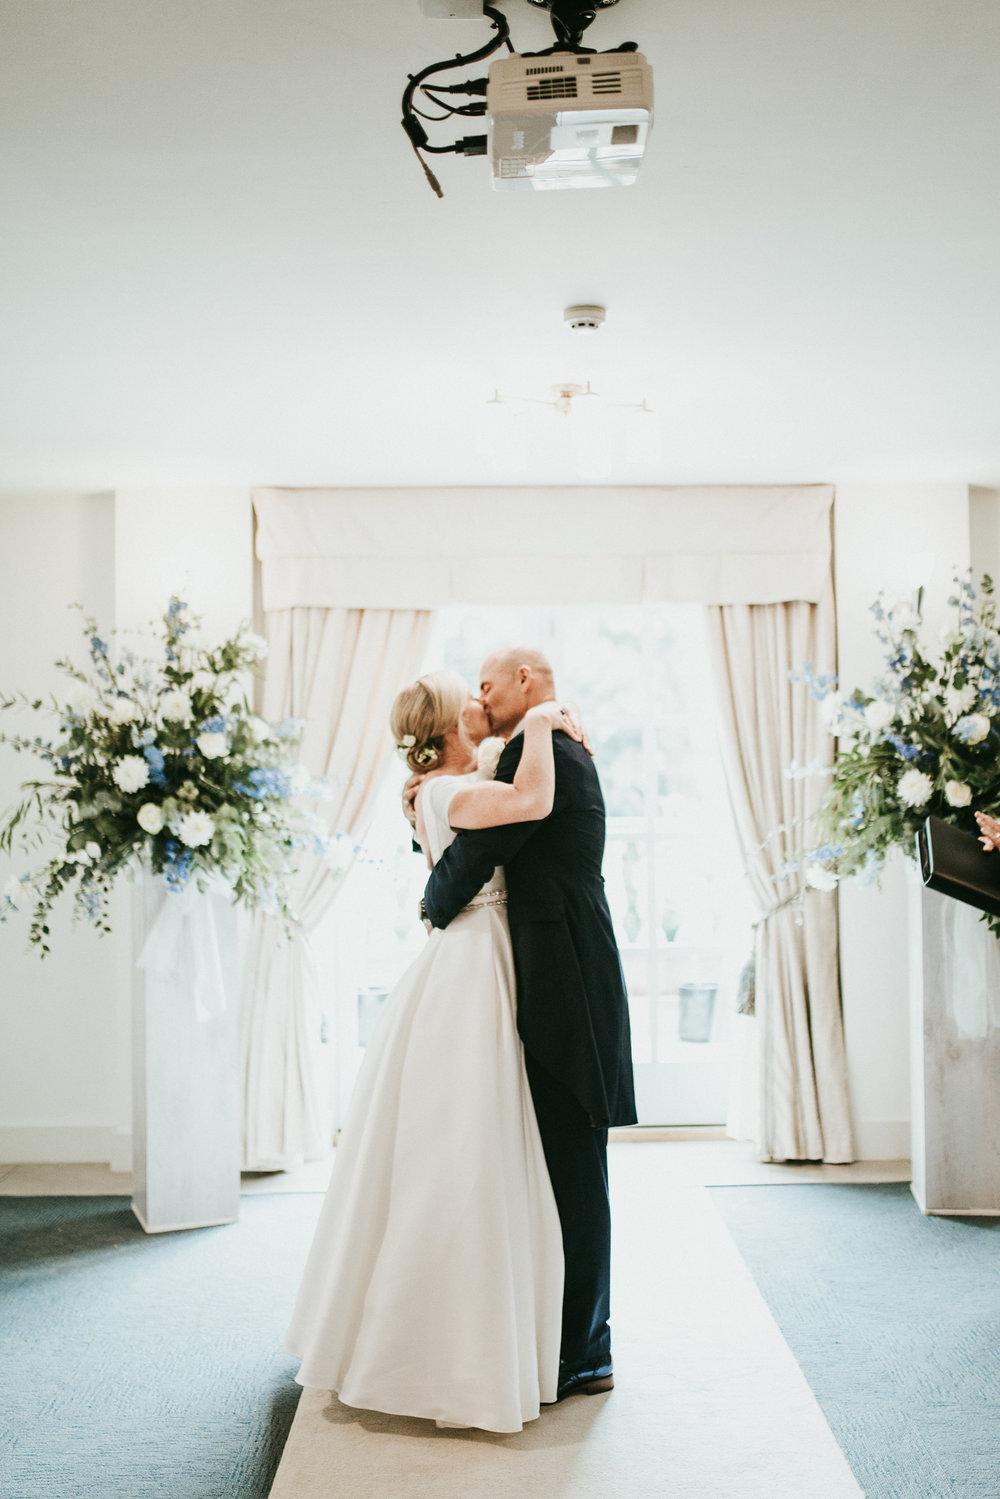 Adam-Rhiannon-Wedding-Photography-The-Italian-Villa-Poole-Bournemouth-Adventure-Beach-Darina-Stoda-28.jpg